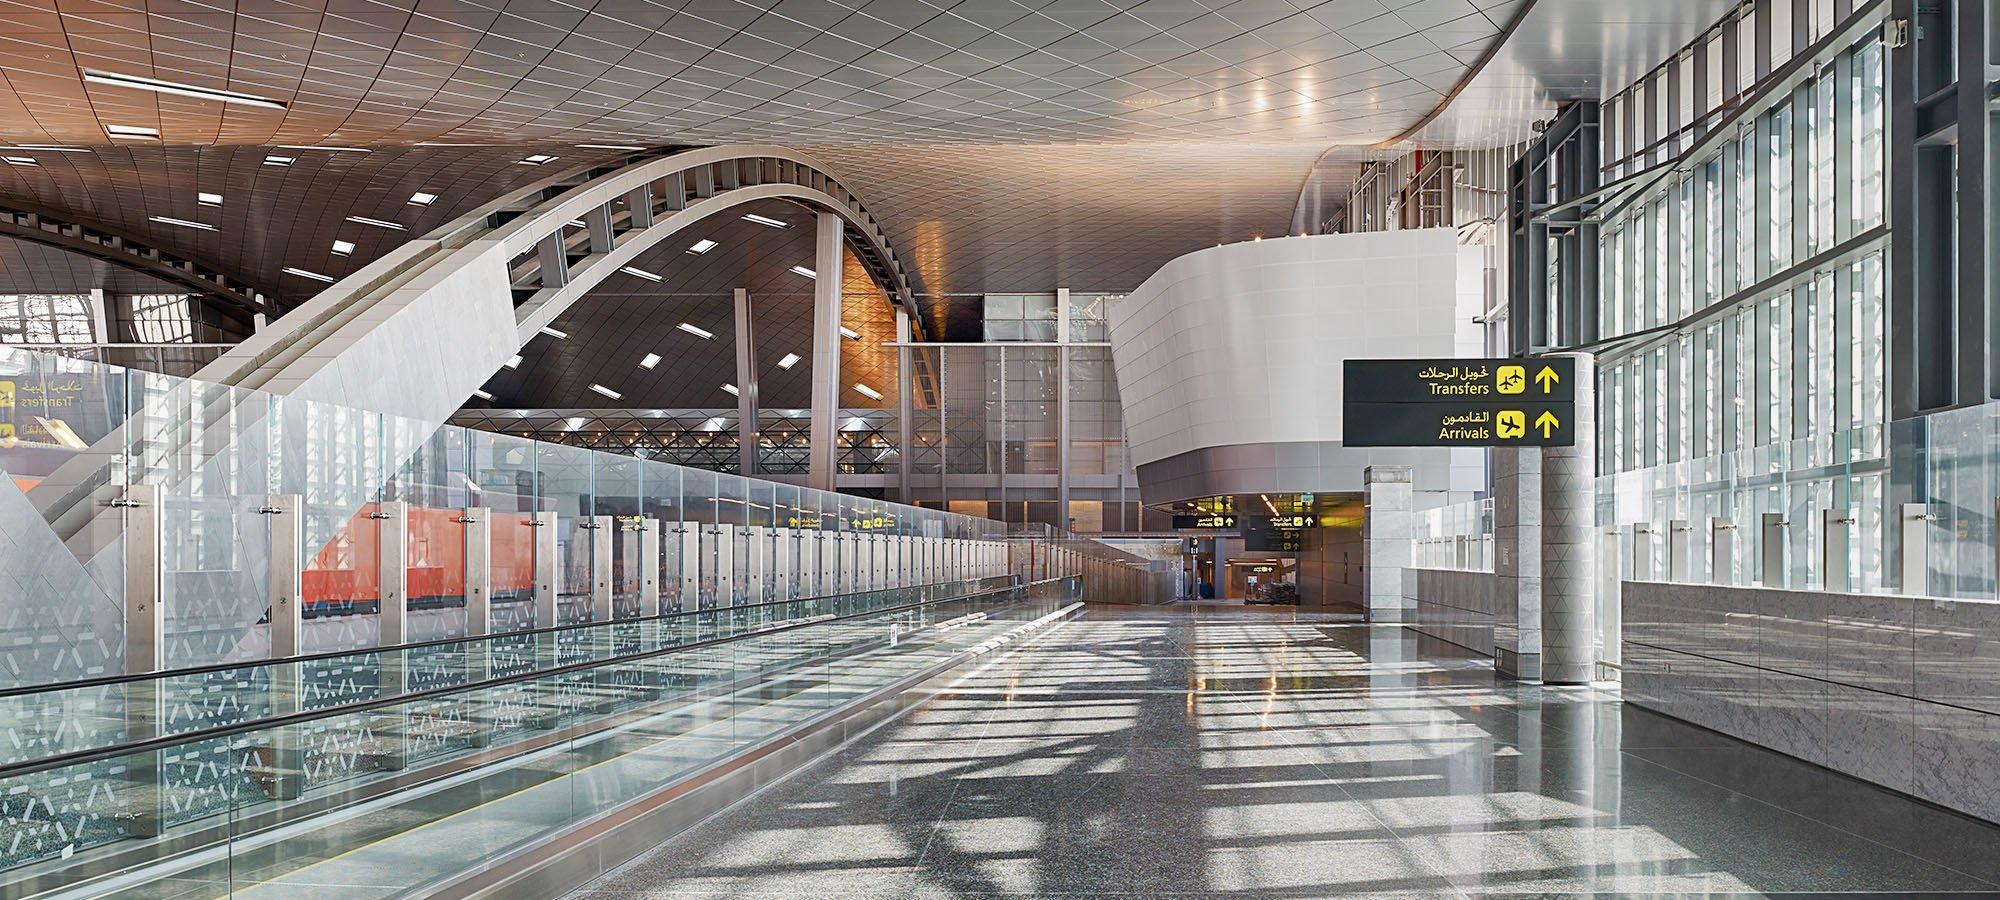 passenger terminal empty